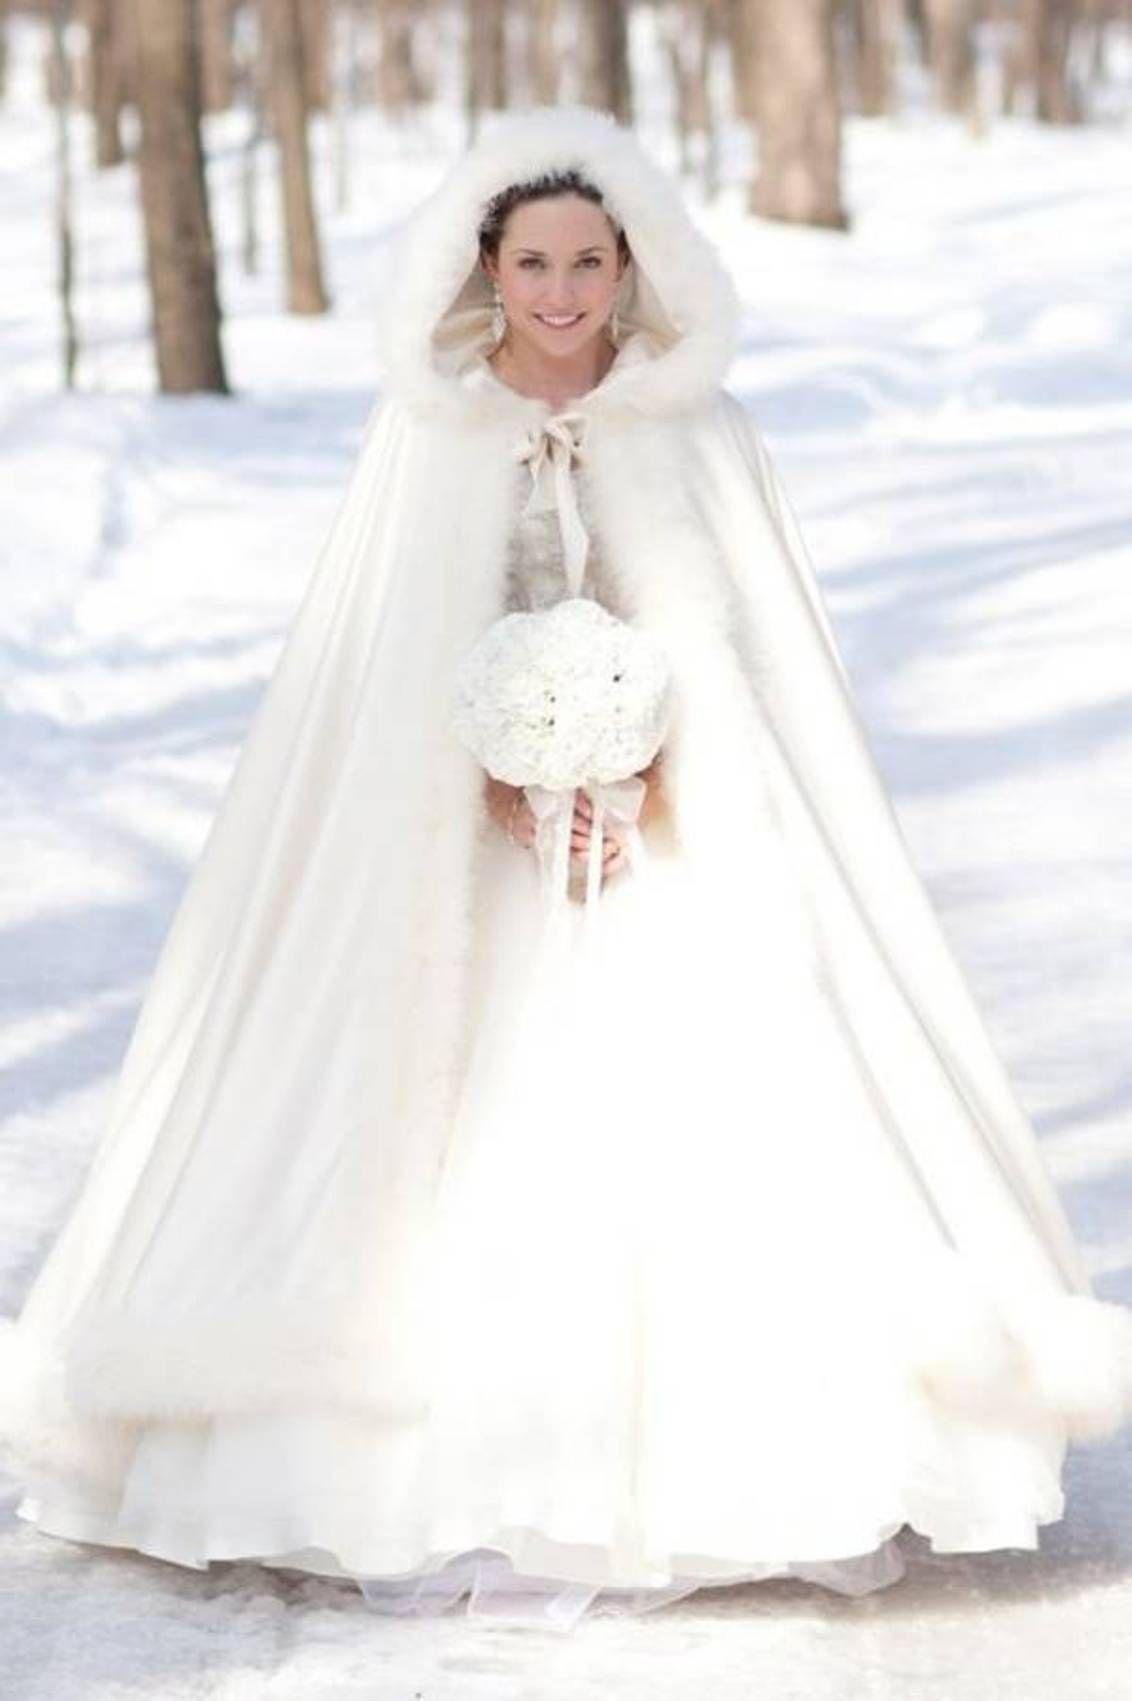 Adorable Winter Wedding Dresses Winter Wedding Dress Wedding Cloak Winter Bride [ 1701 x 1132 Pixel ]